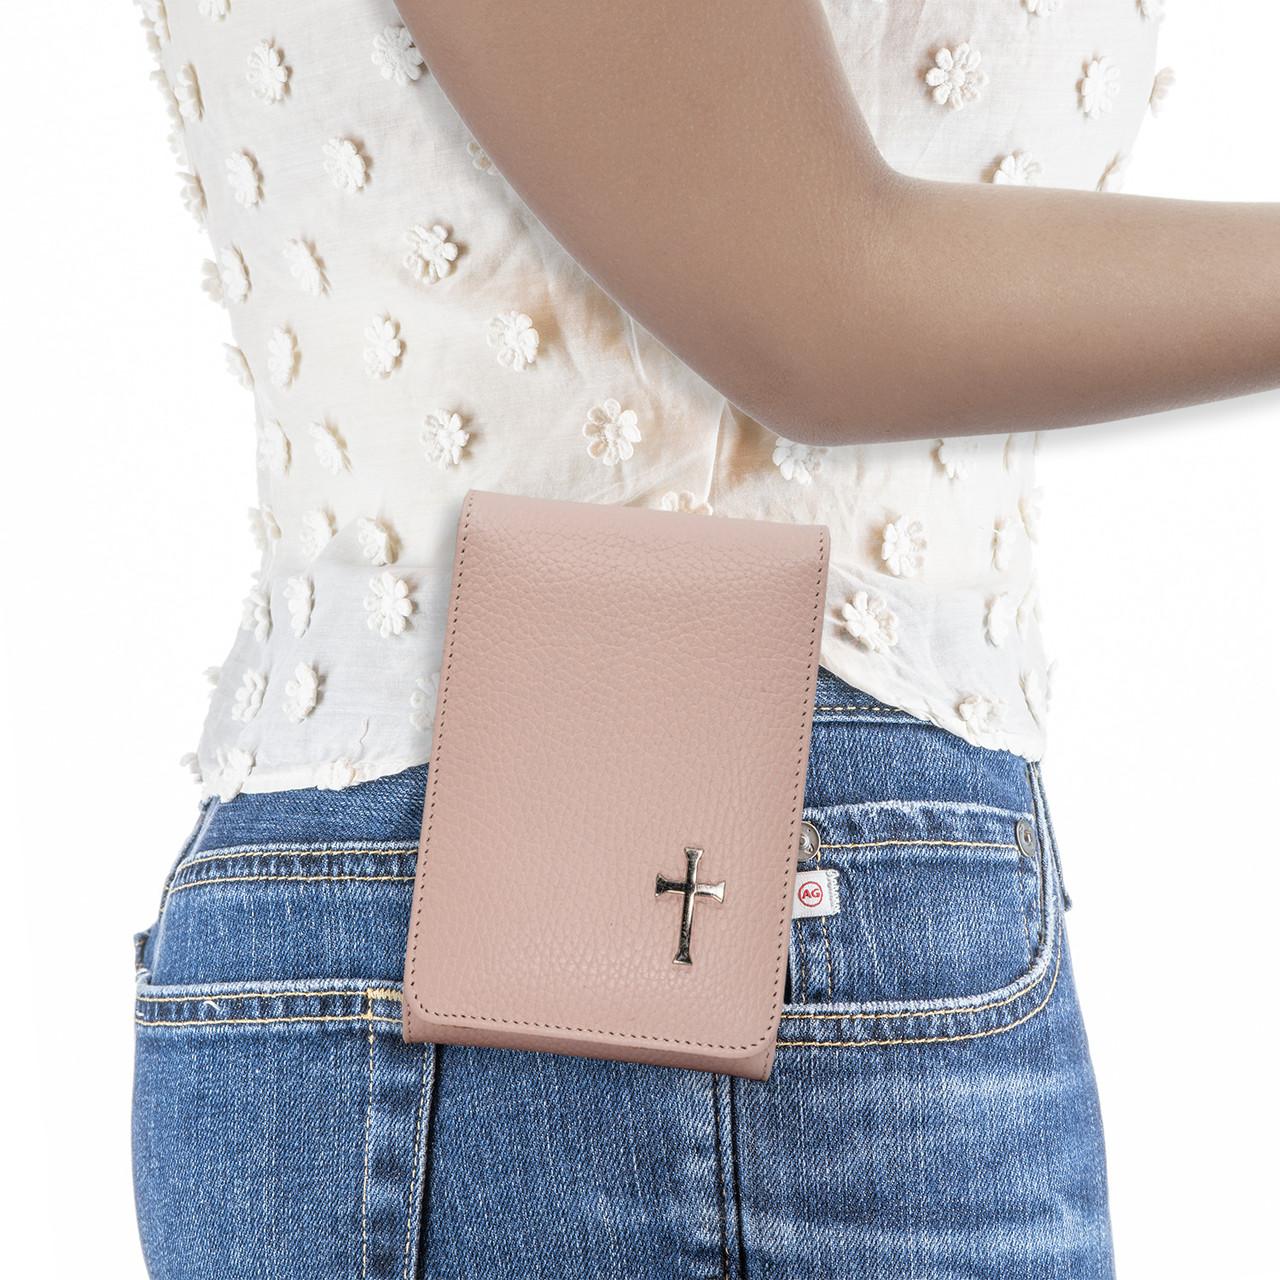 Taurus G3 Pink Carry Faithfully Cross Holster